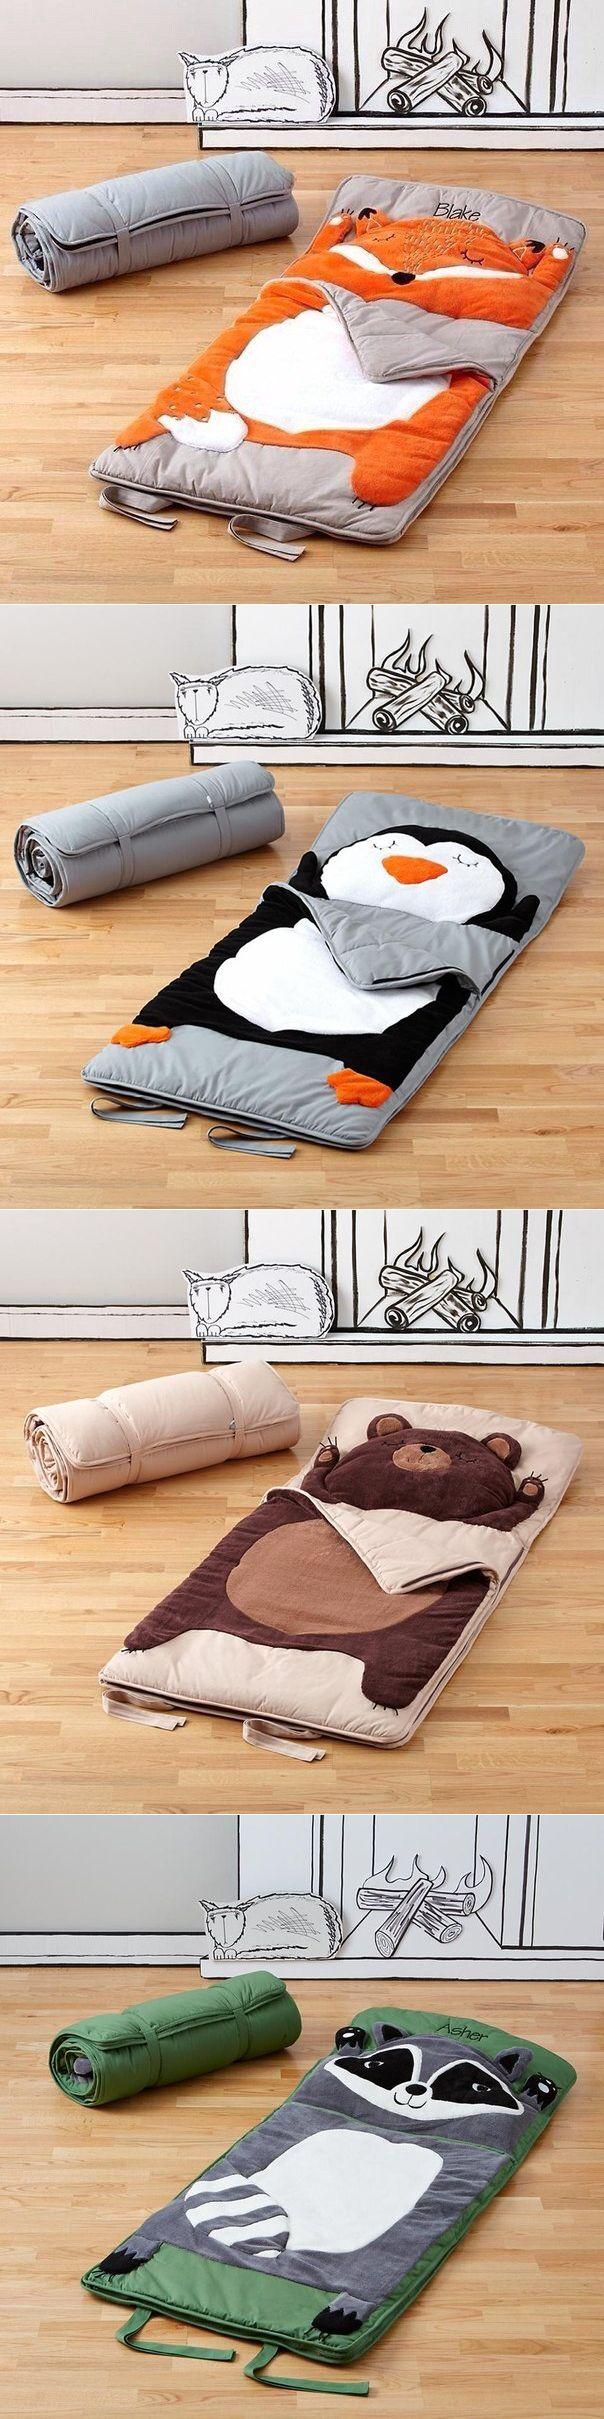 Cute sleeping bags.  Penguin for Thalia.